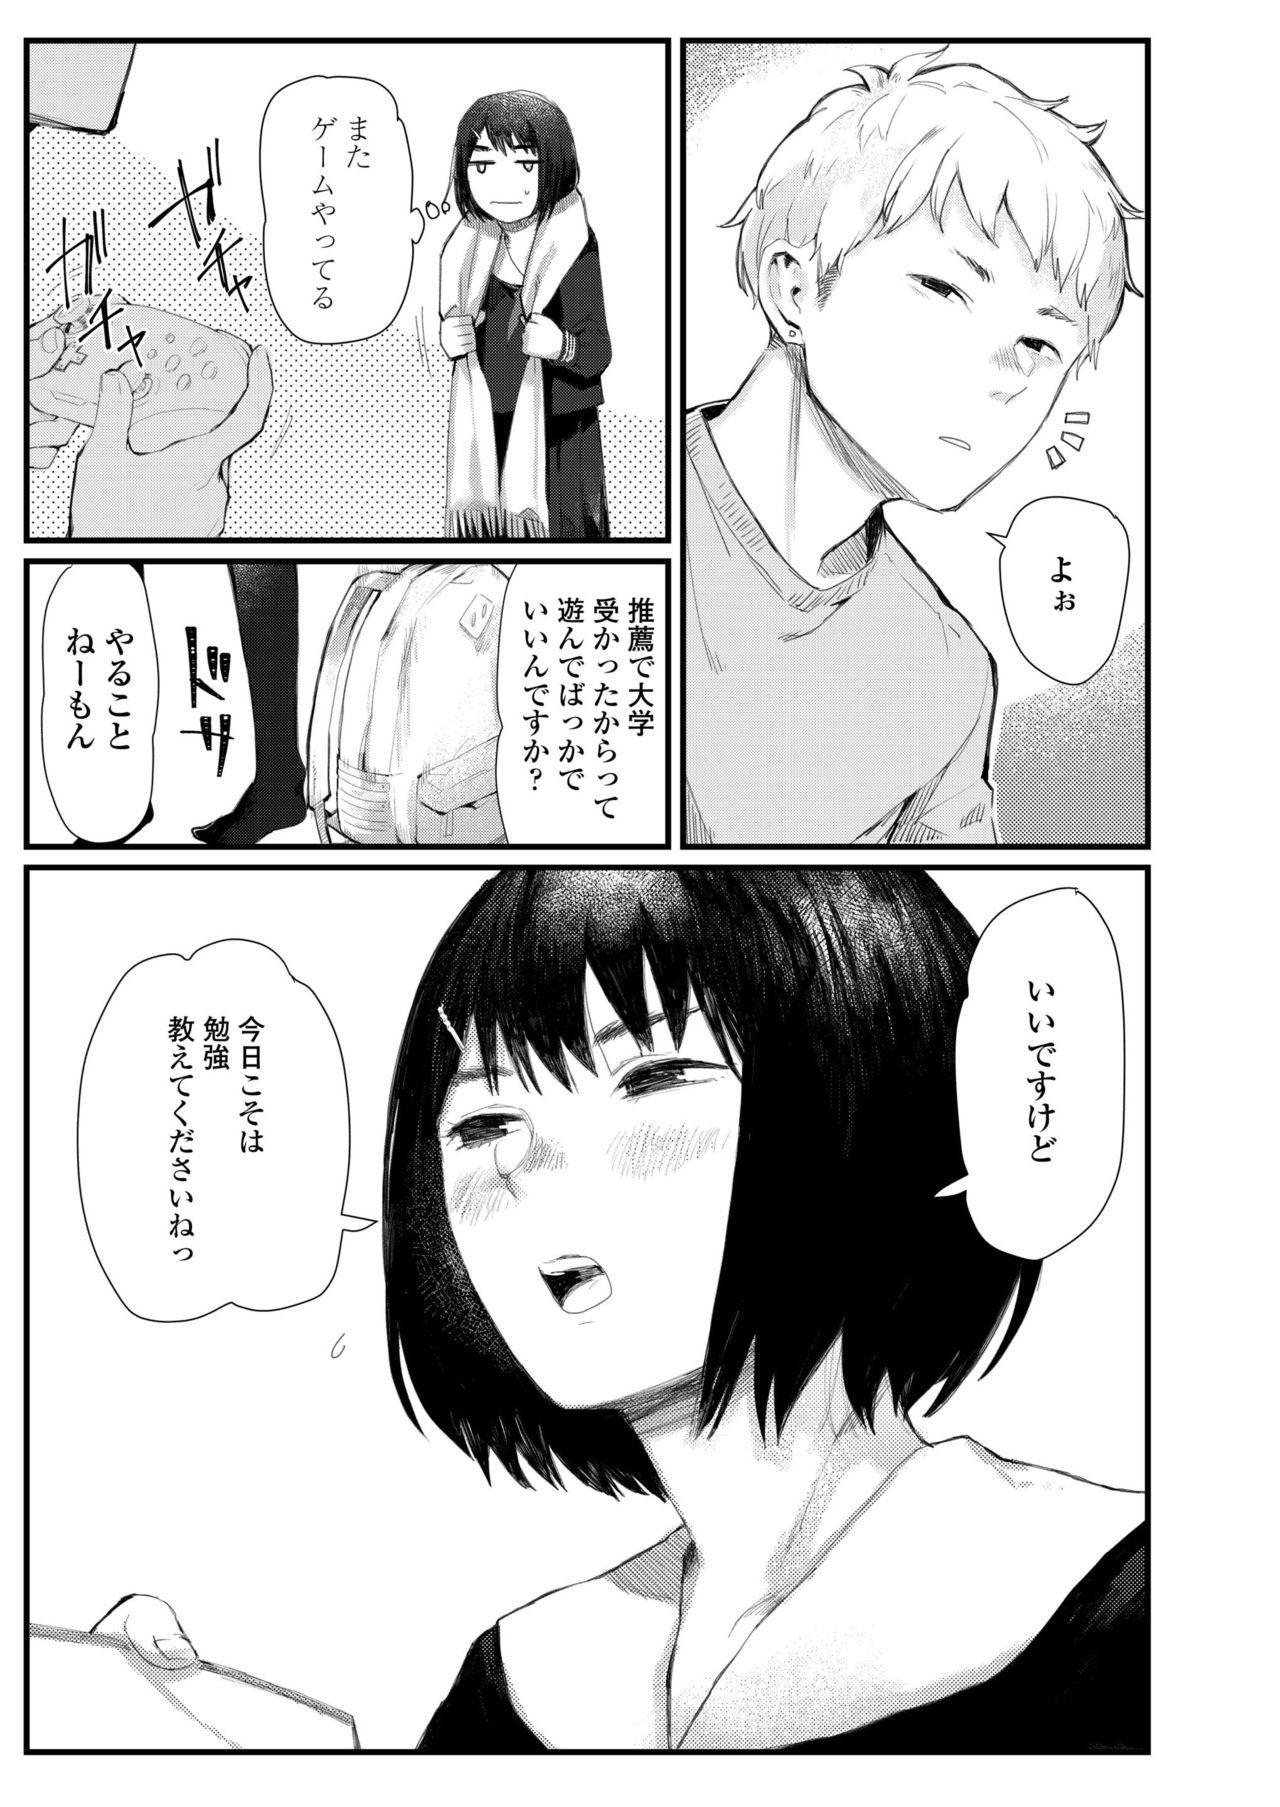 COMIC AOHA 2019 Haru 420